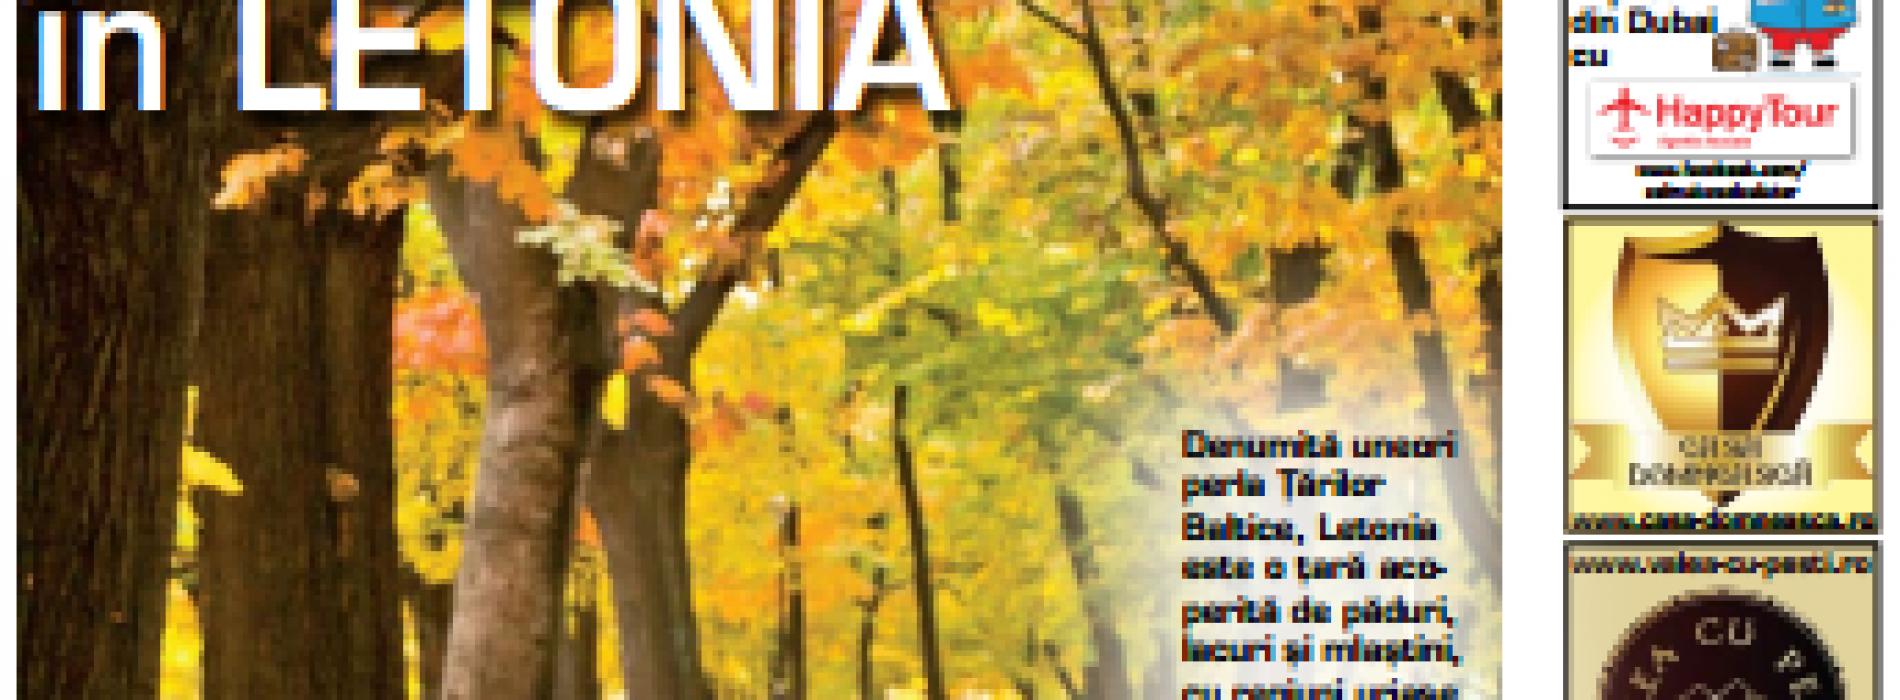 Coperta Turism Club Noiembrie 2013